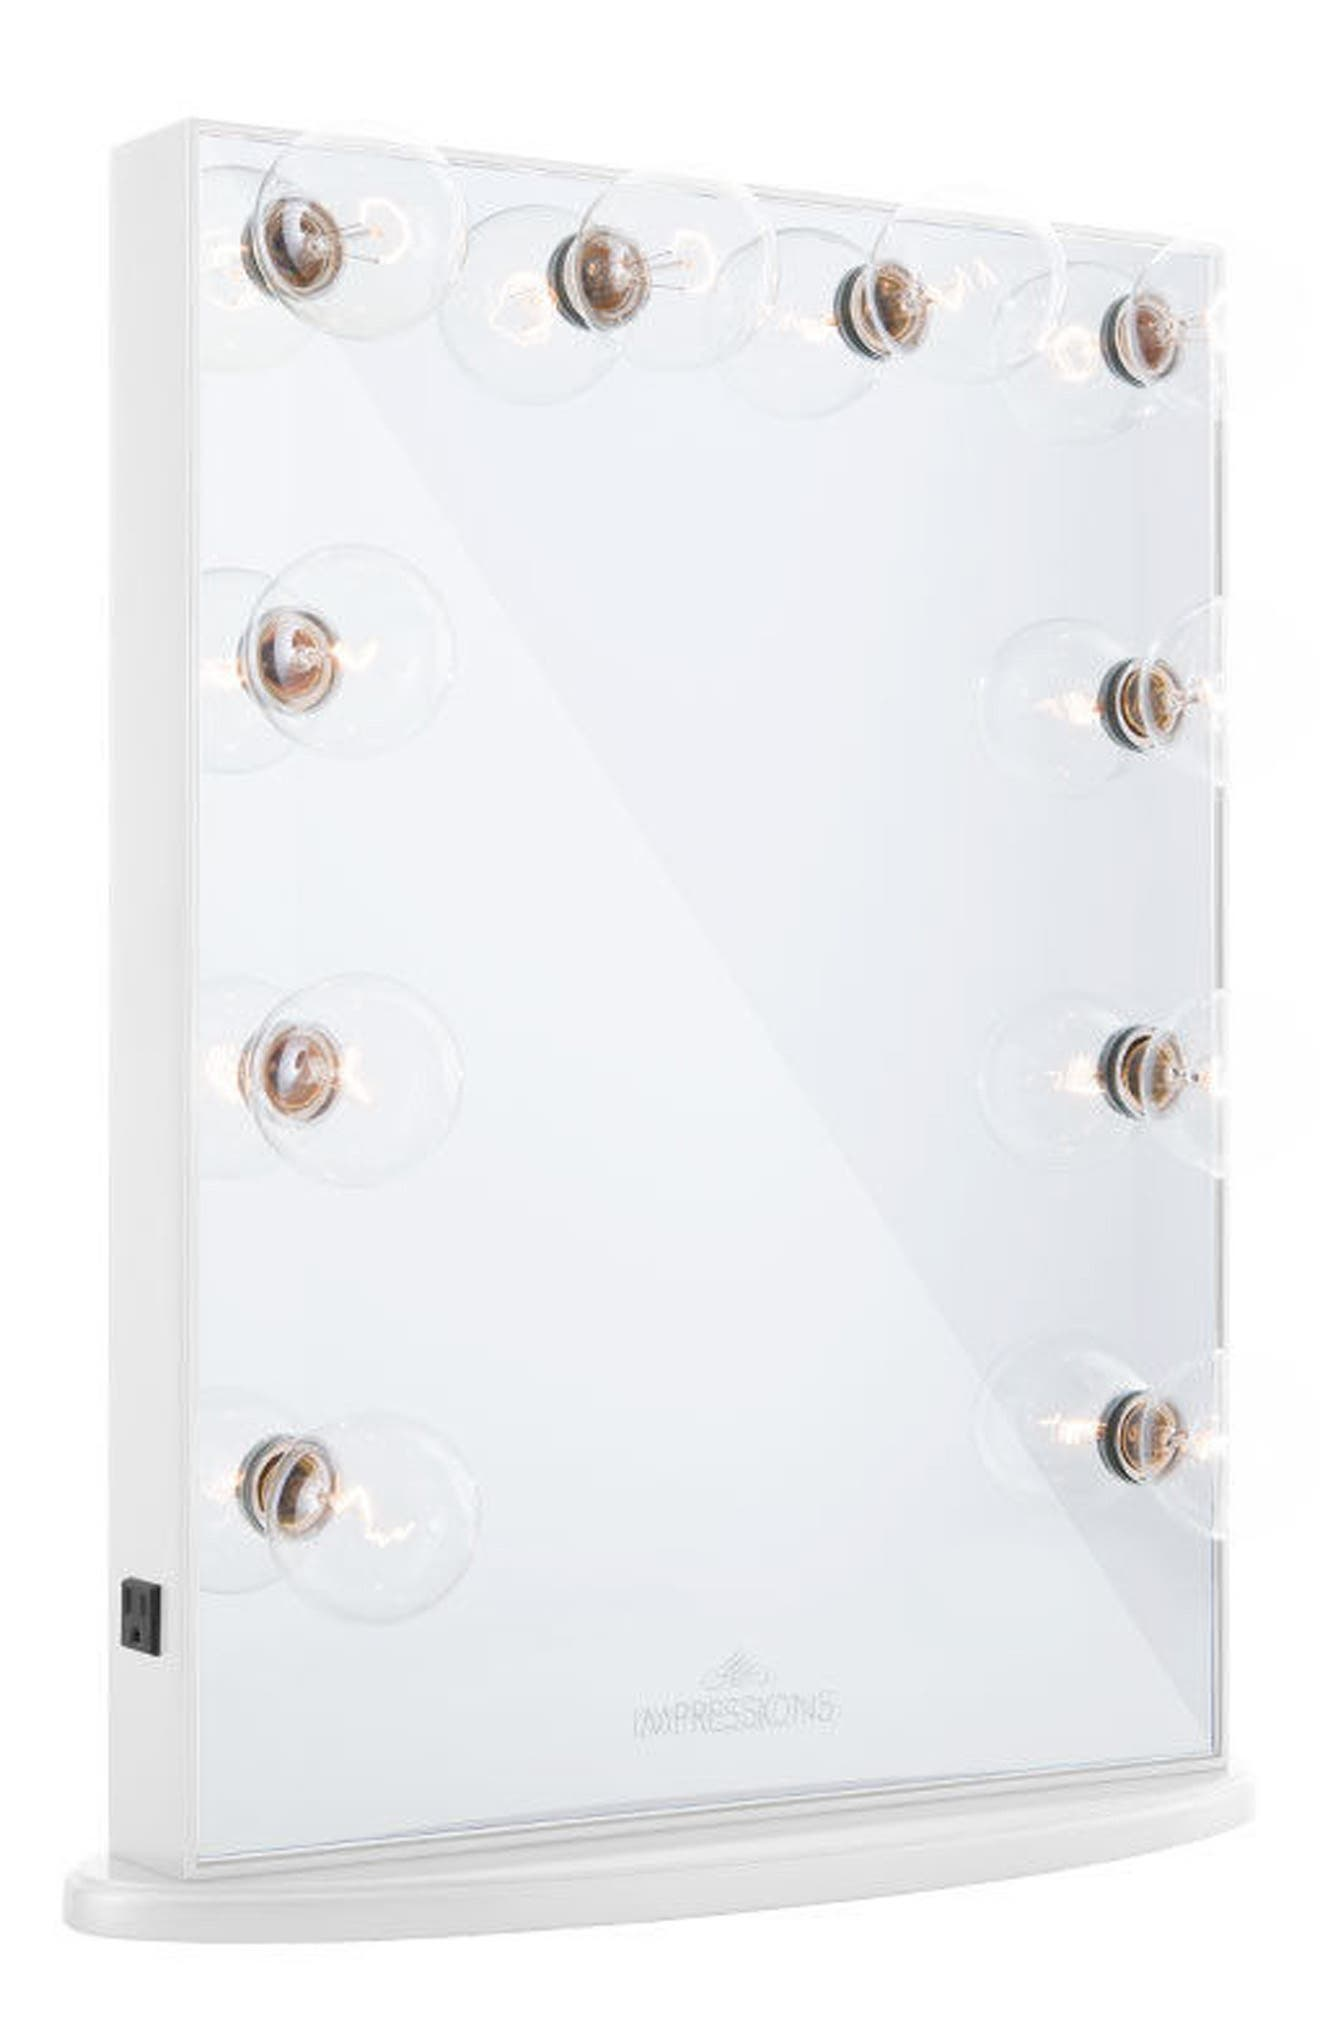 Main Image - Impressions Vanity Co. Hollywood Glow™ Vanity Mirror